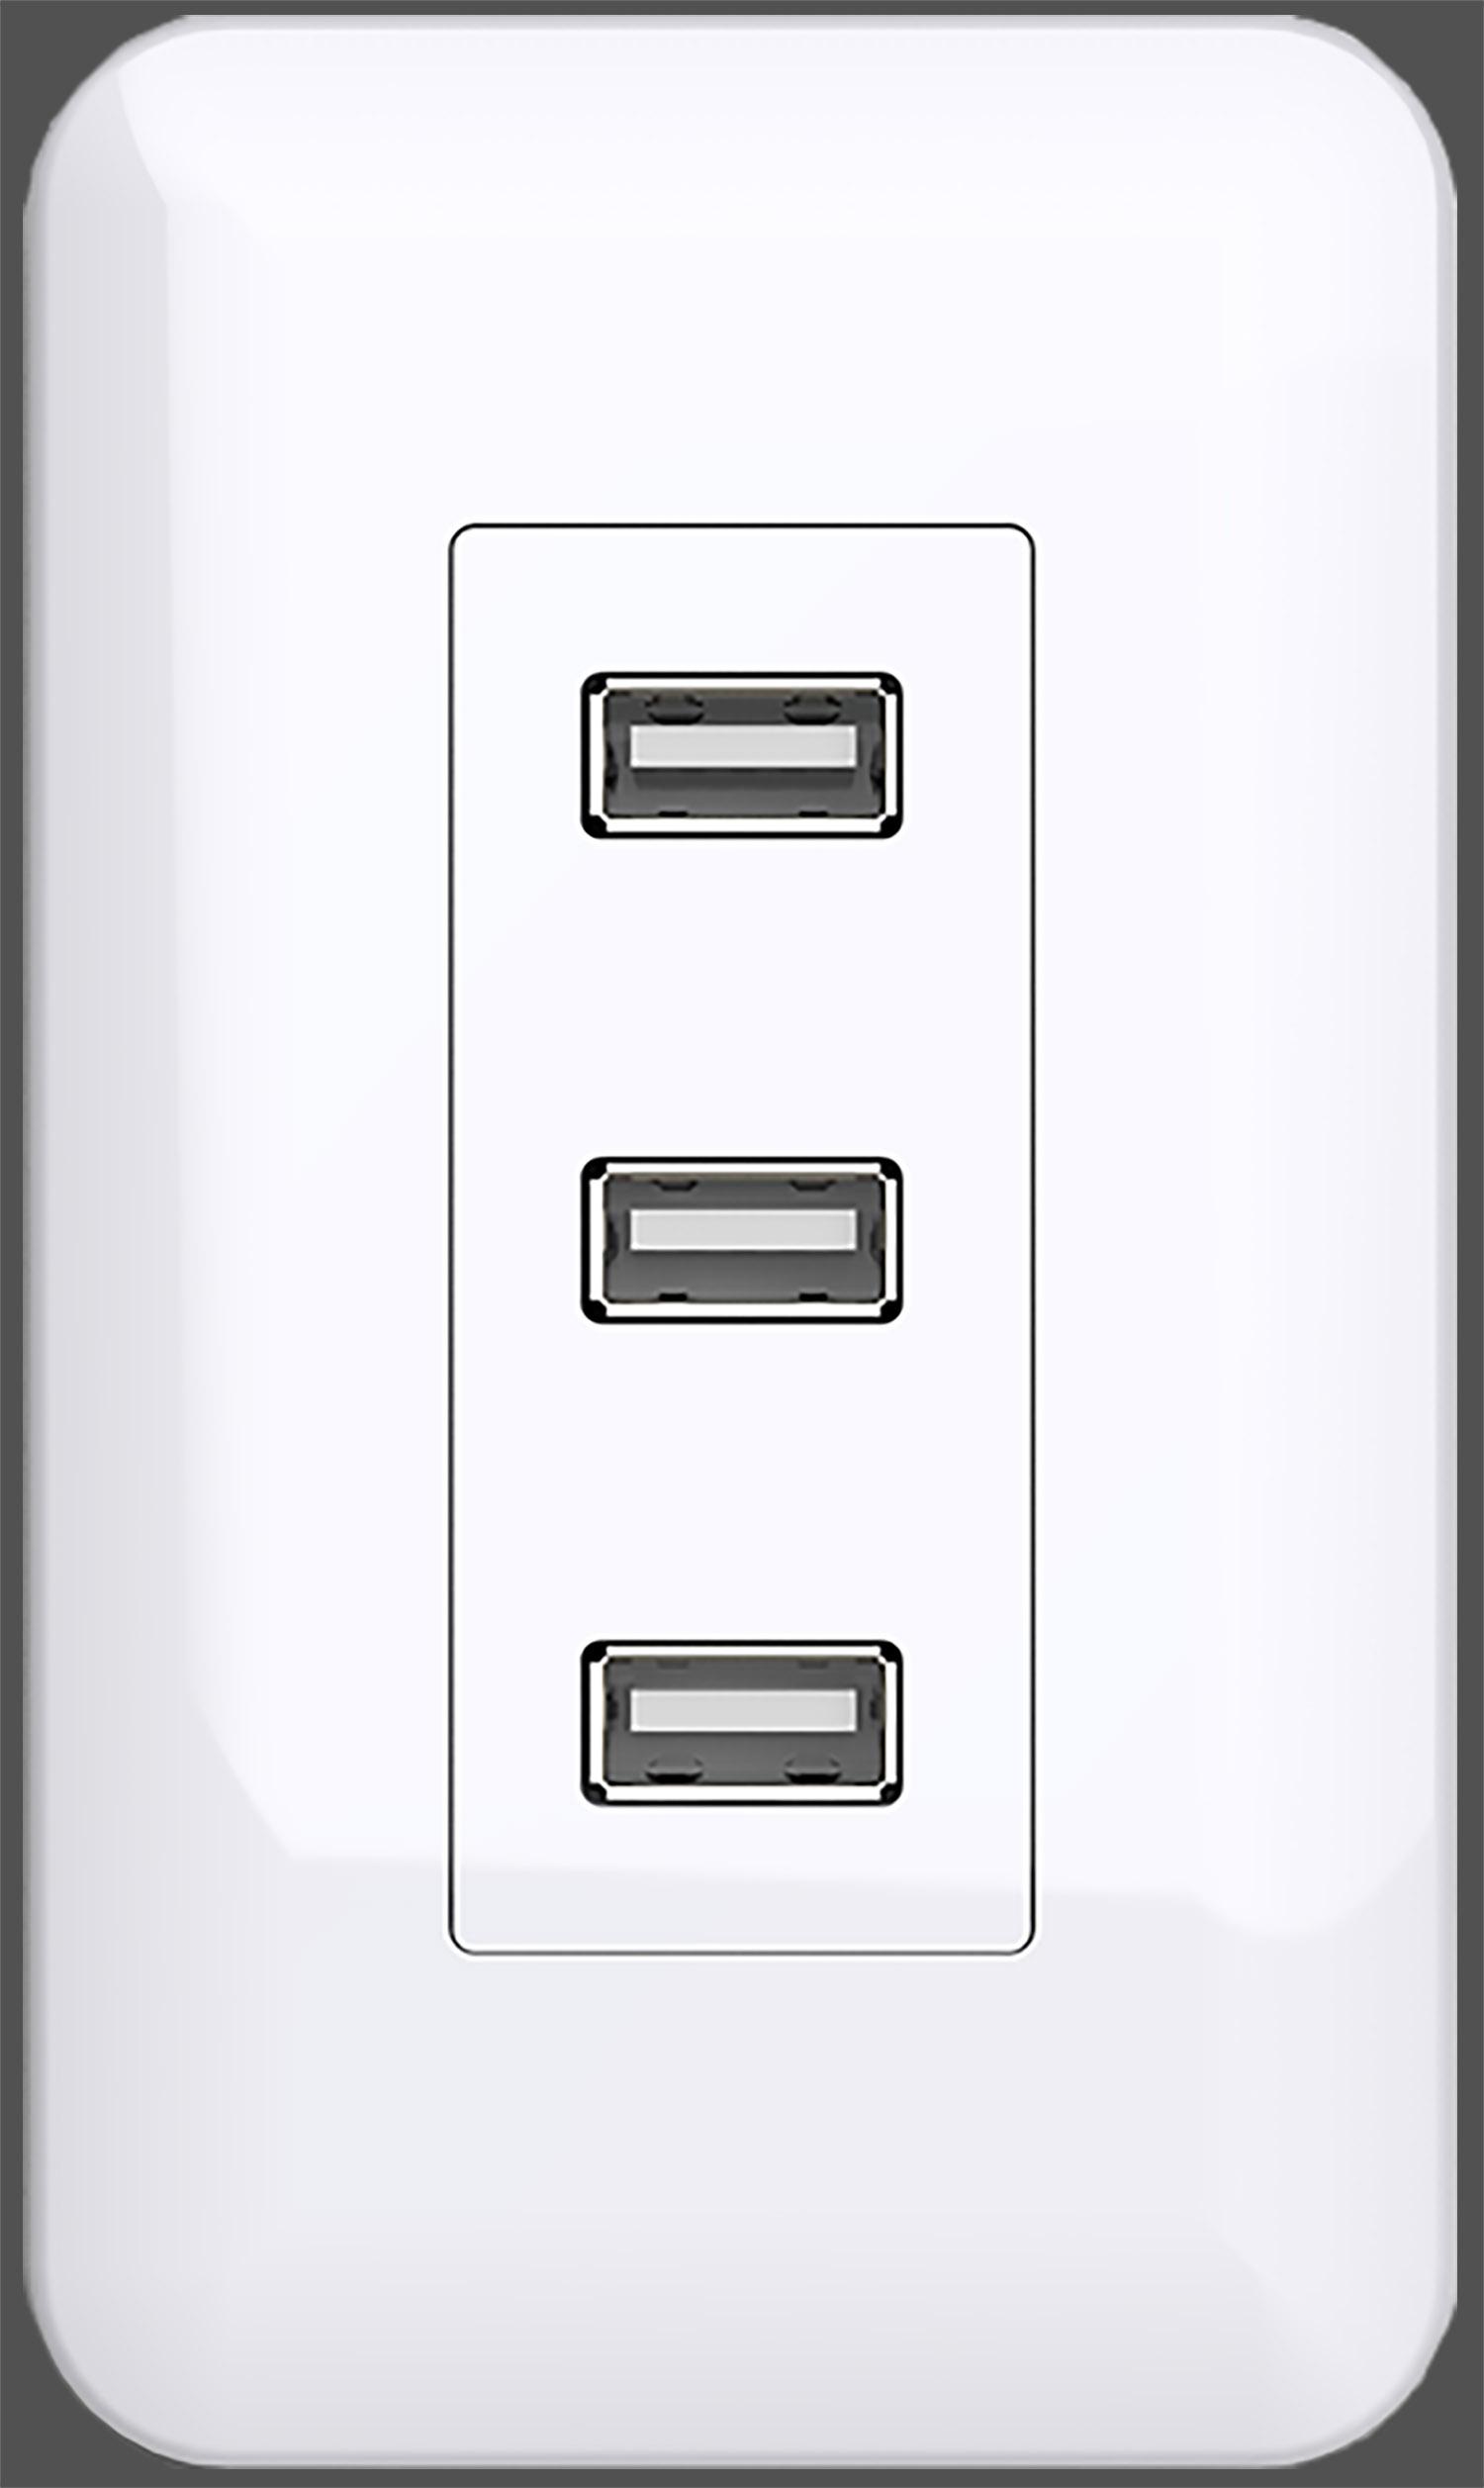 Aufkleber USB Dose Fake Steckdose täuschend echte Optik ca.6,3 x 10,7cm